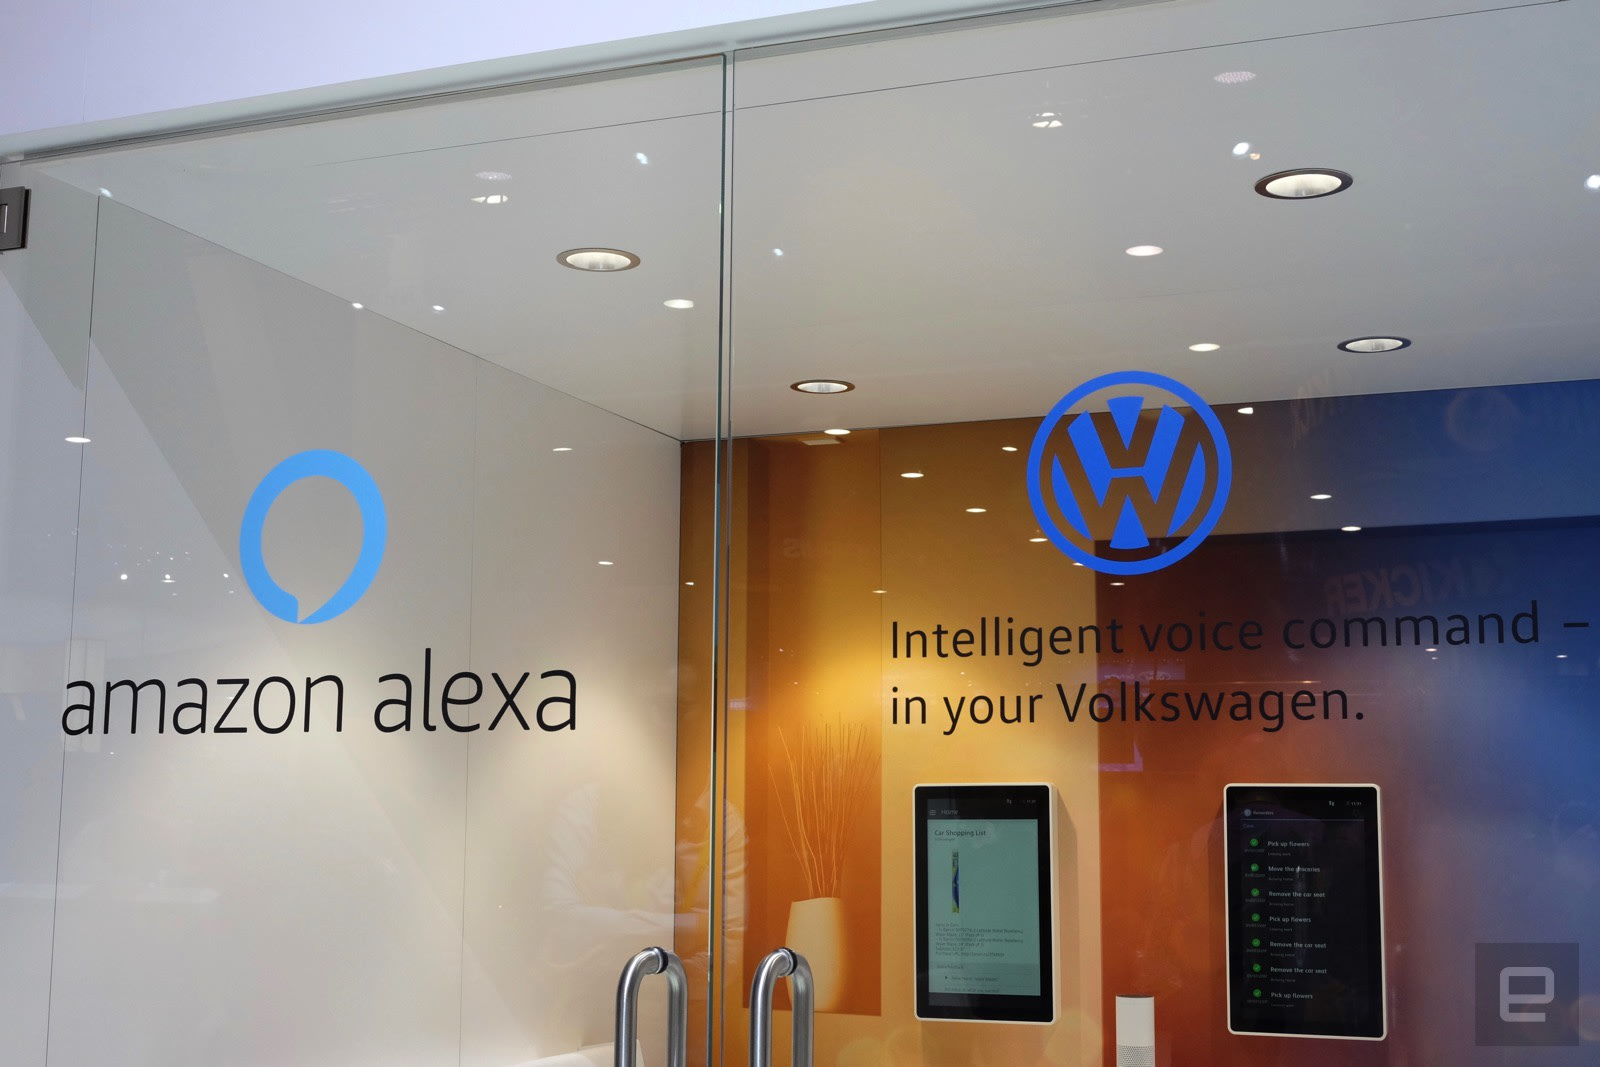 Volkswagen is adding Amazon Alexa to its cars